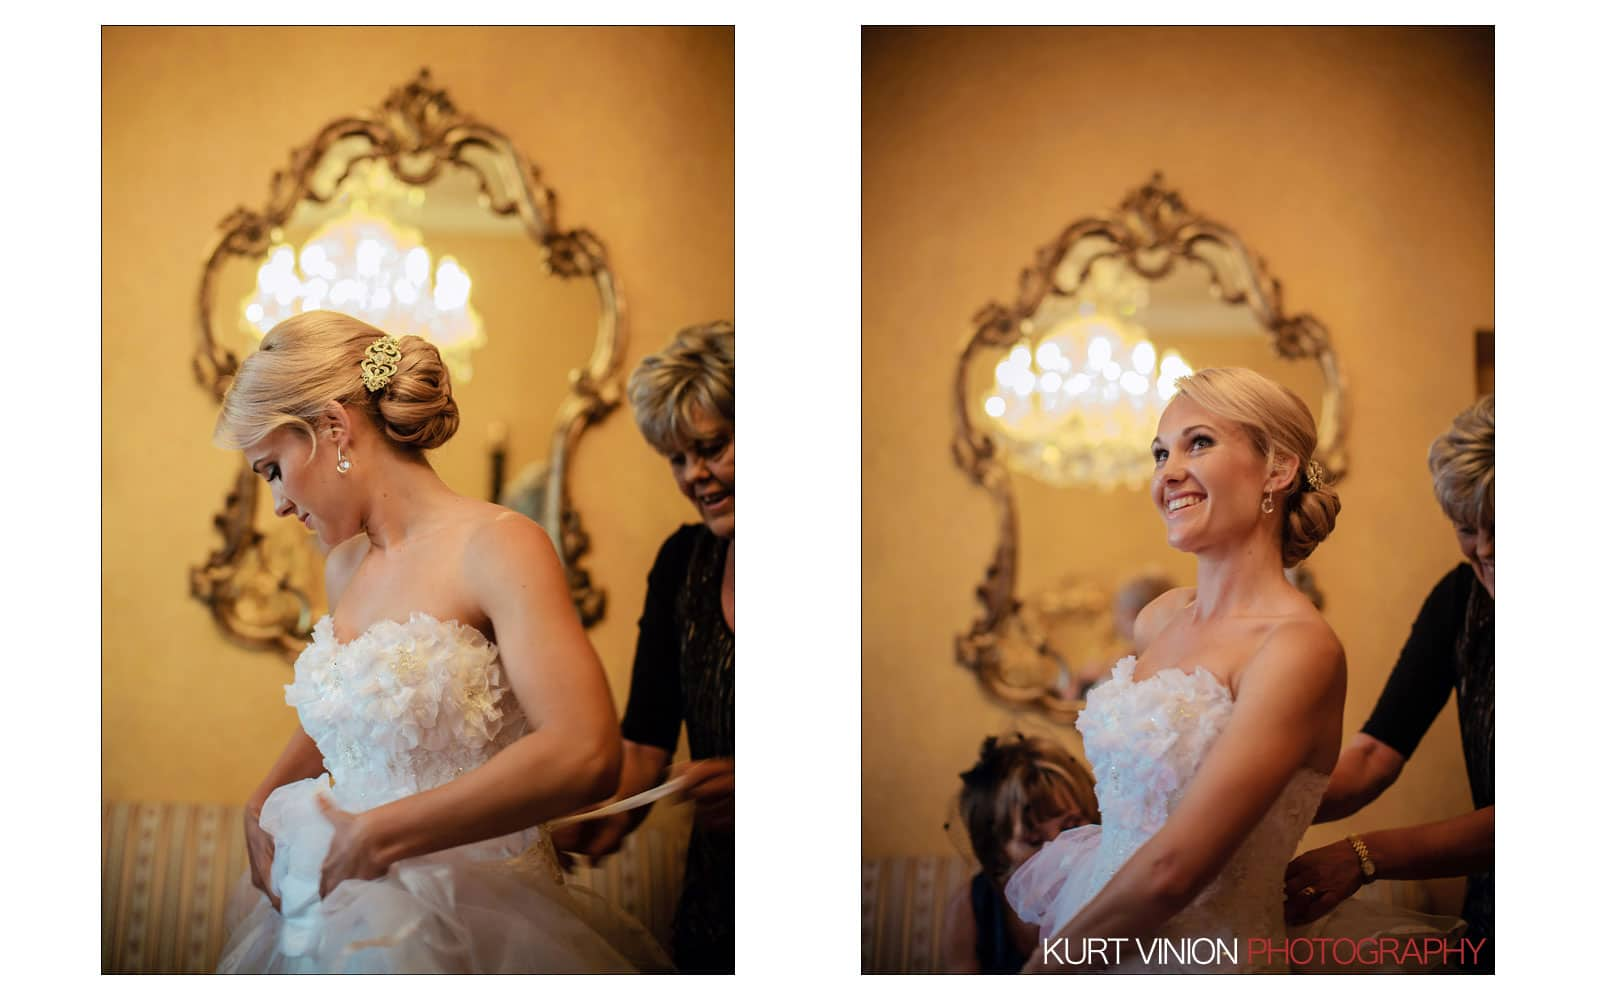 Prague Clementinum wedding / Jess + James - bridal portraits at the Alchymist